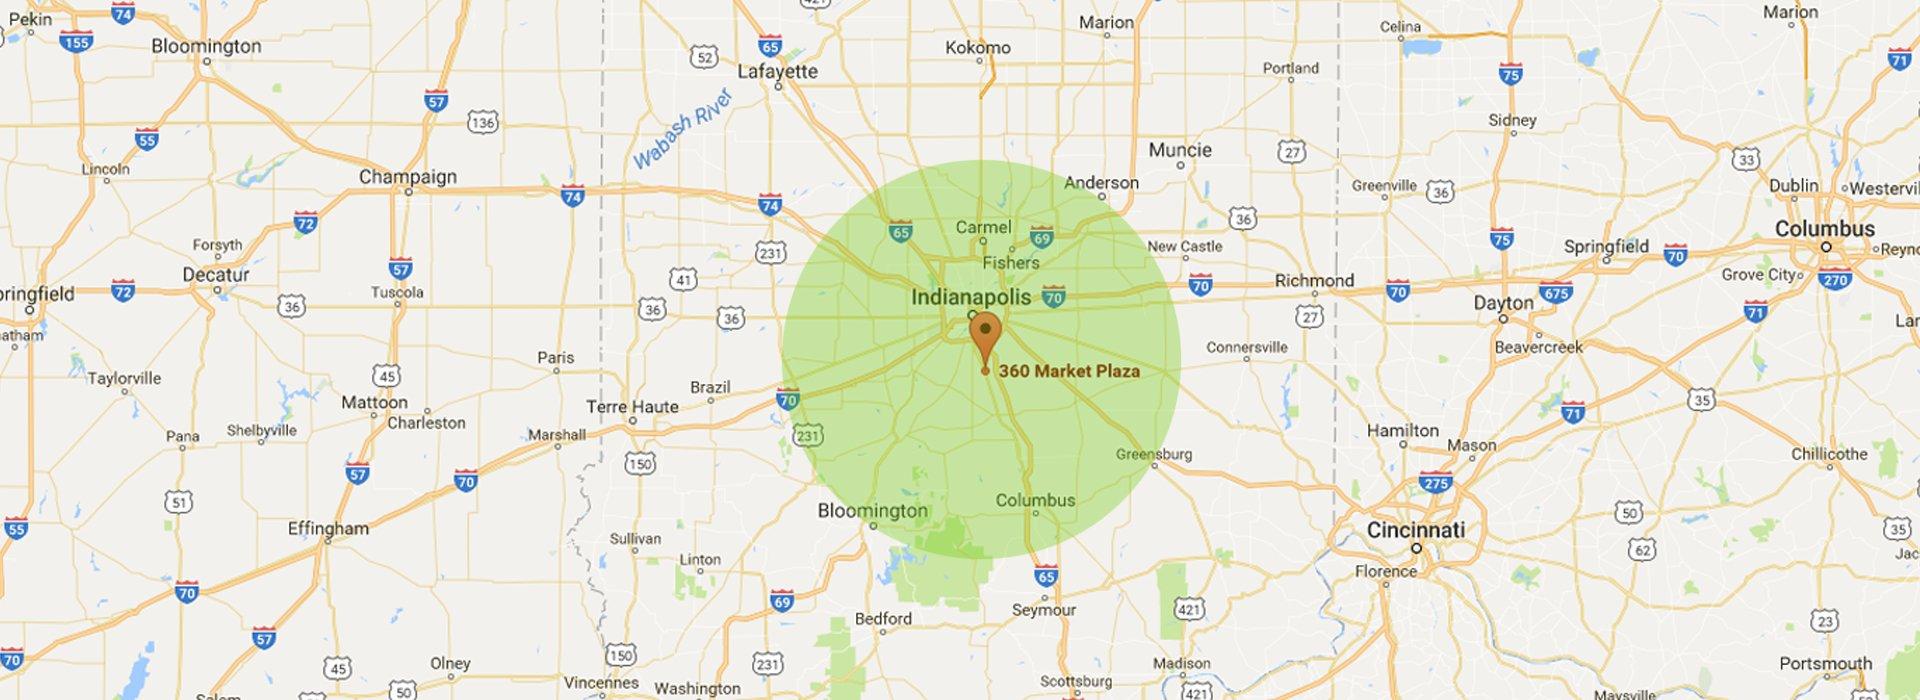 Indy Shades Inc. | 317-255-8238